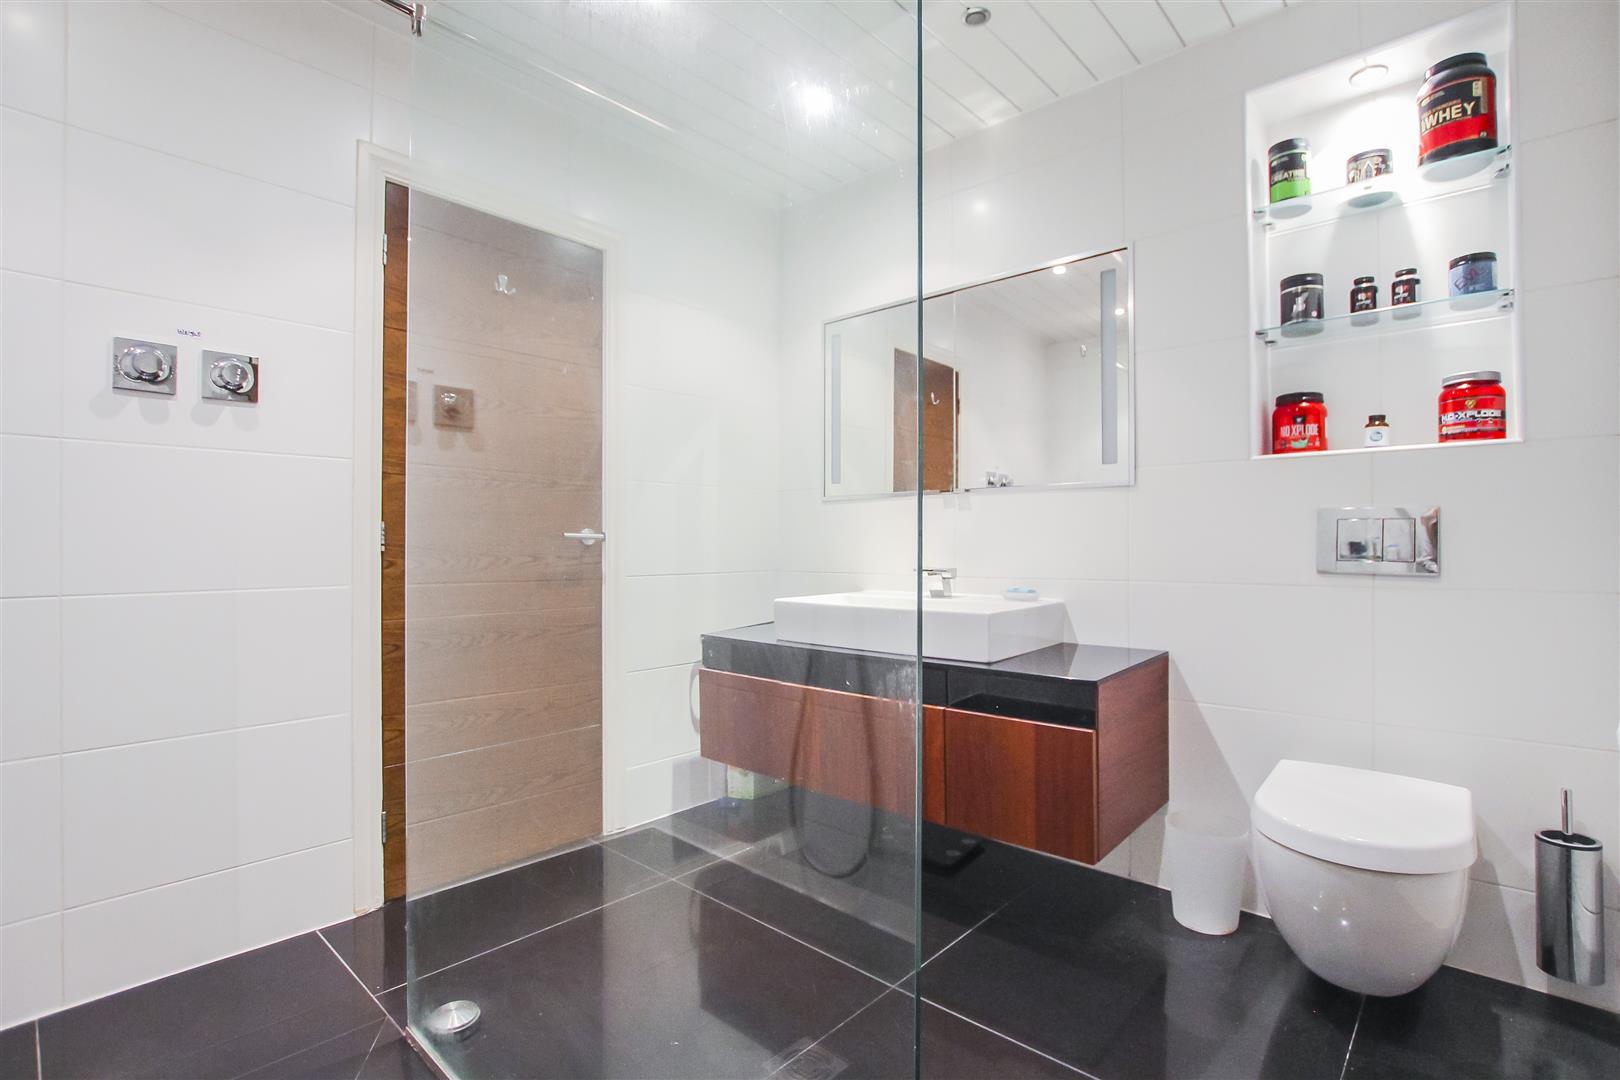 6 Bedroom Detached House For Sale - Bedroom two En-Suite